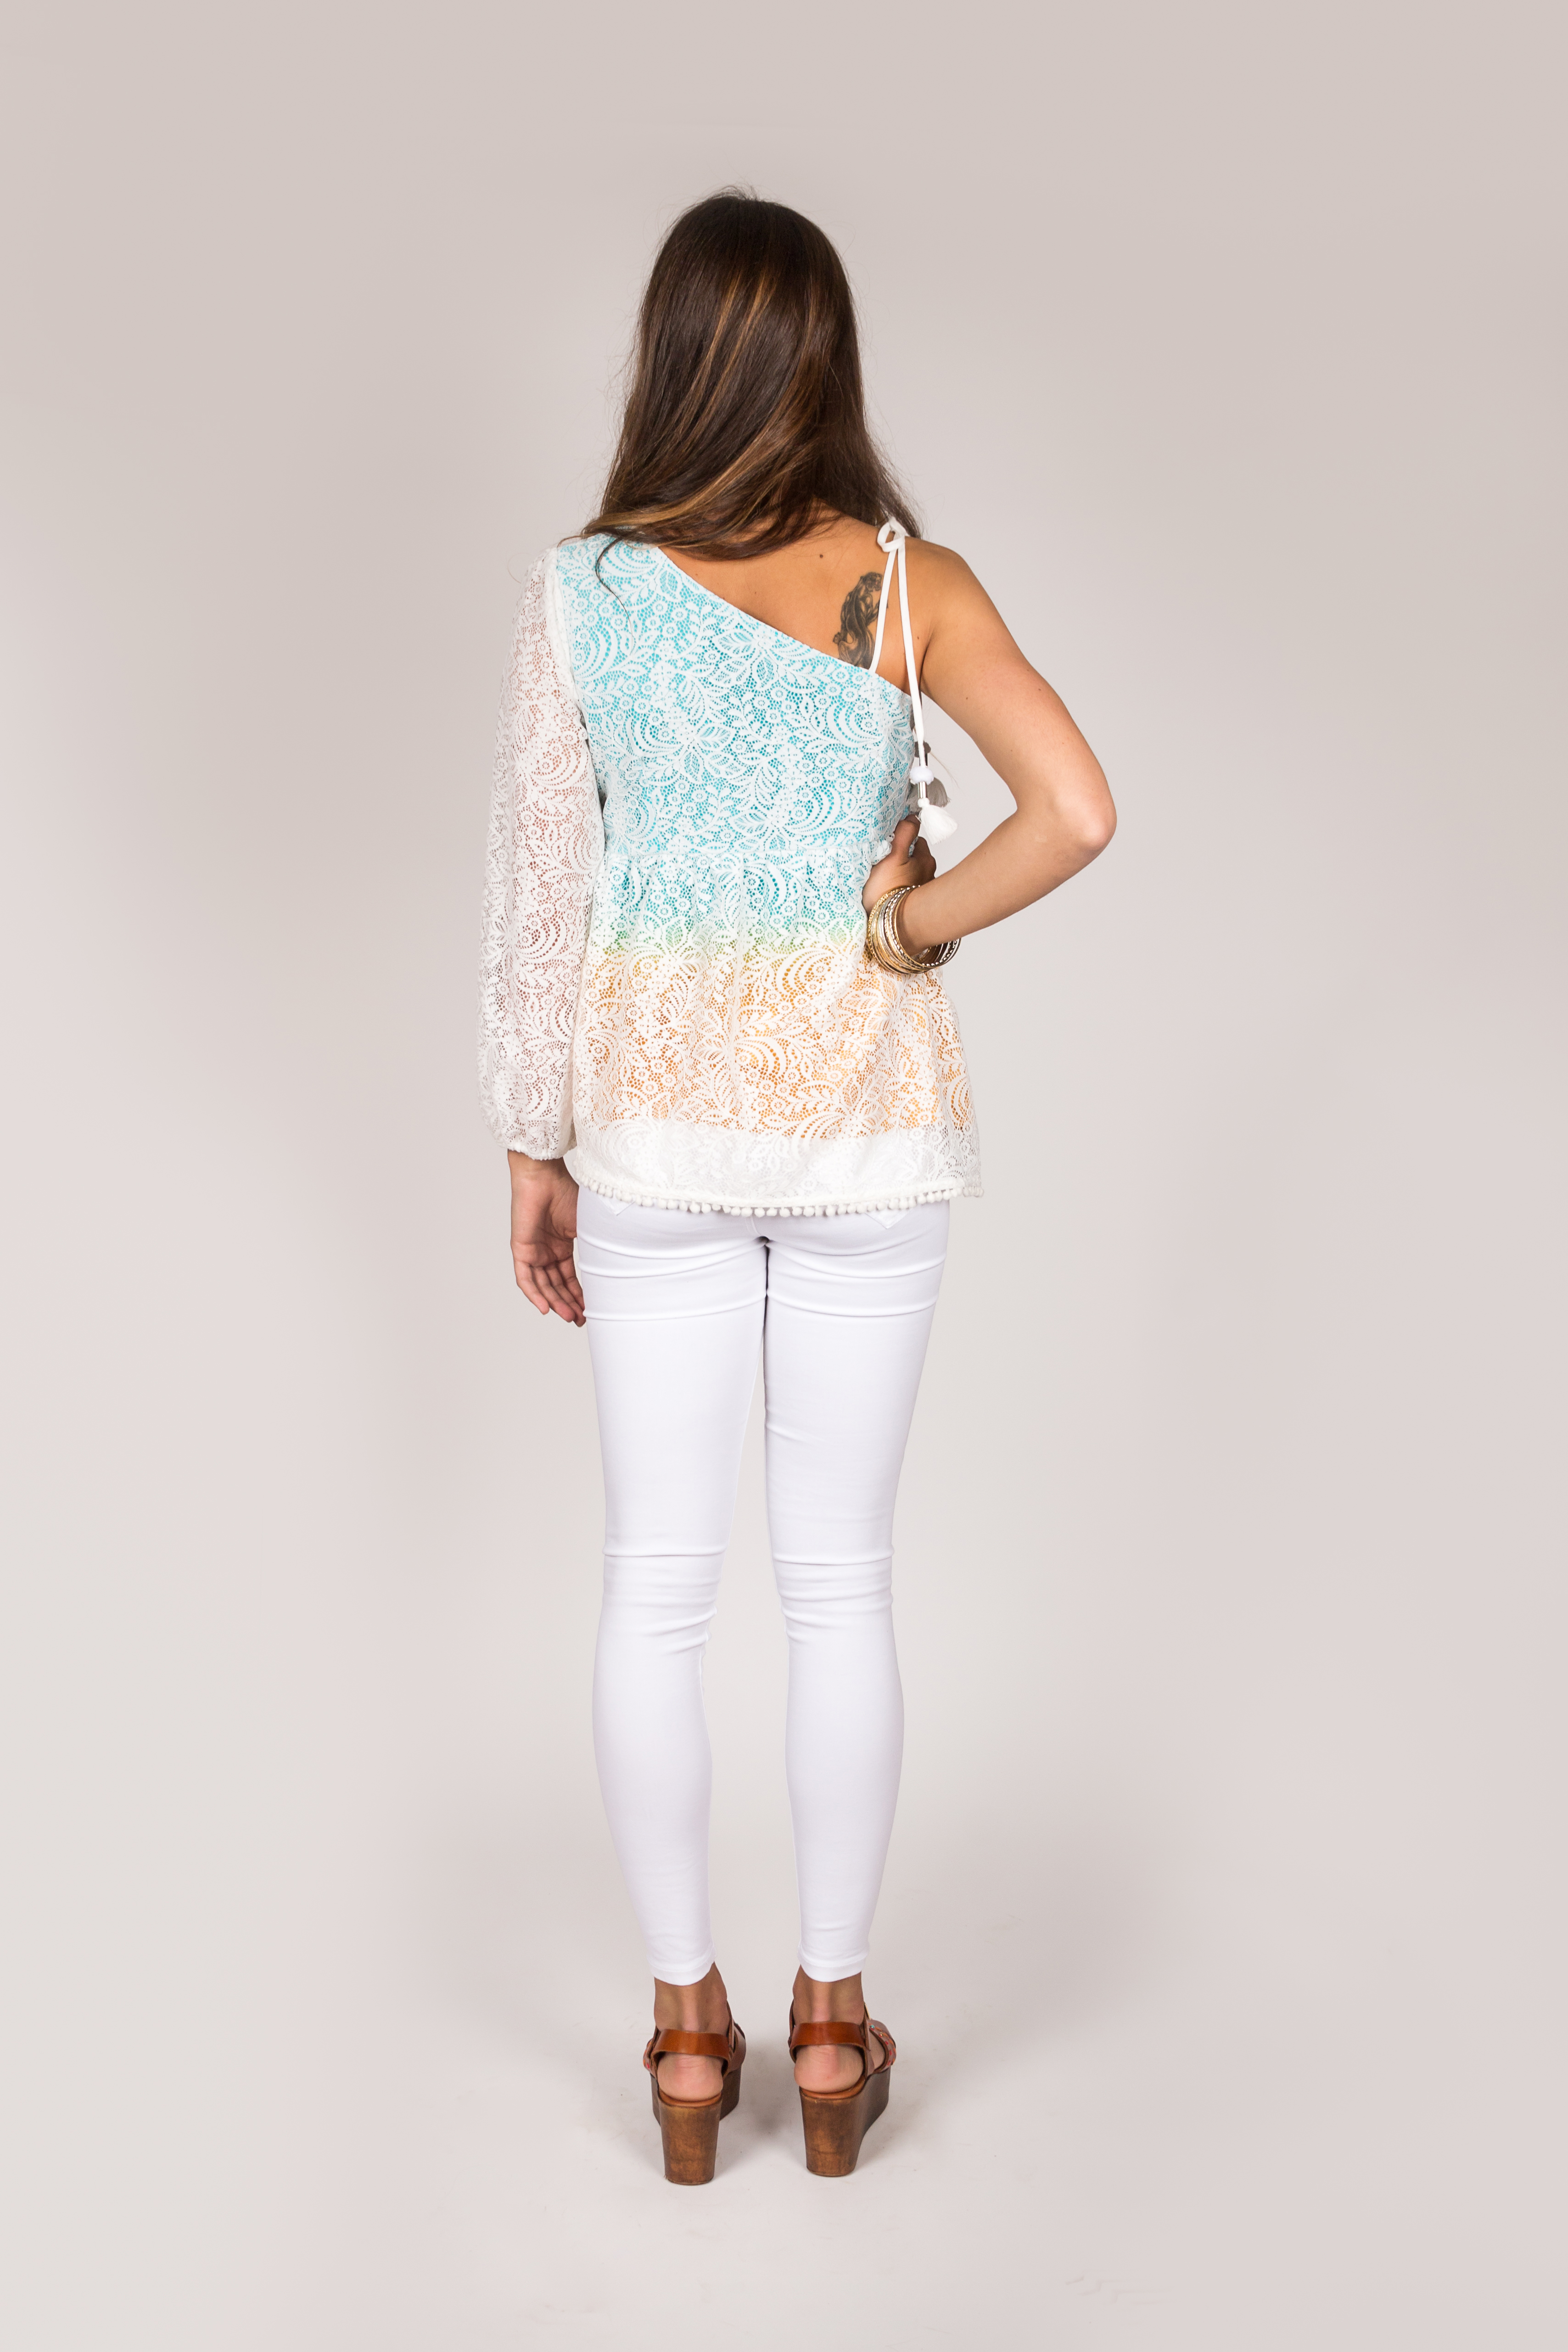 Shoklett: Swirls of Petals Asymmetrical Sleeve Ashley Tunic SOLD OUT